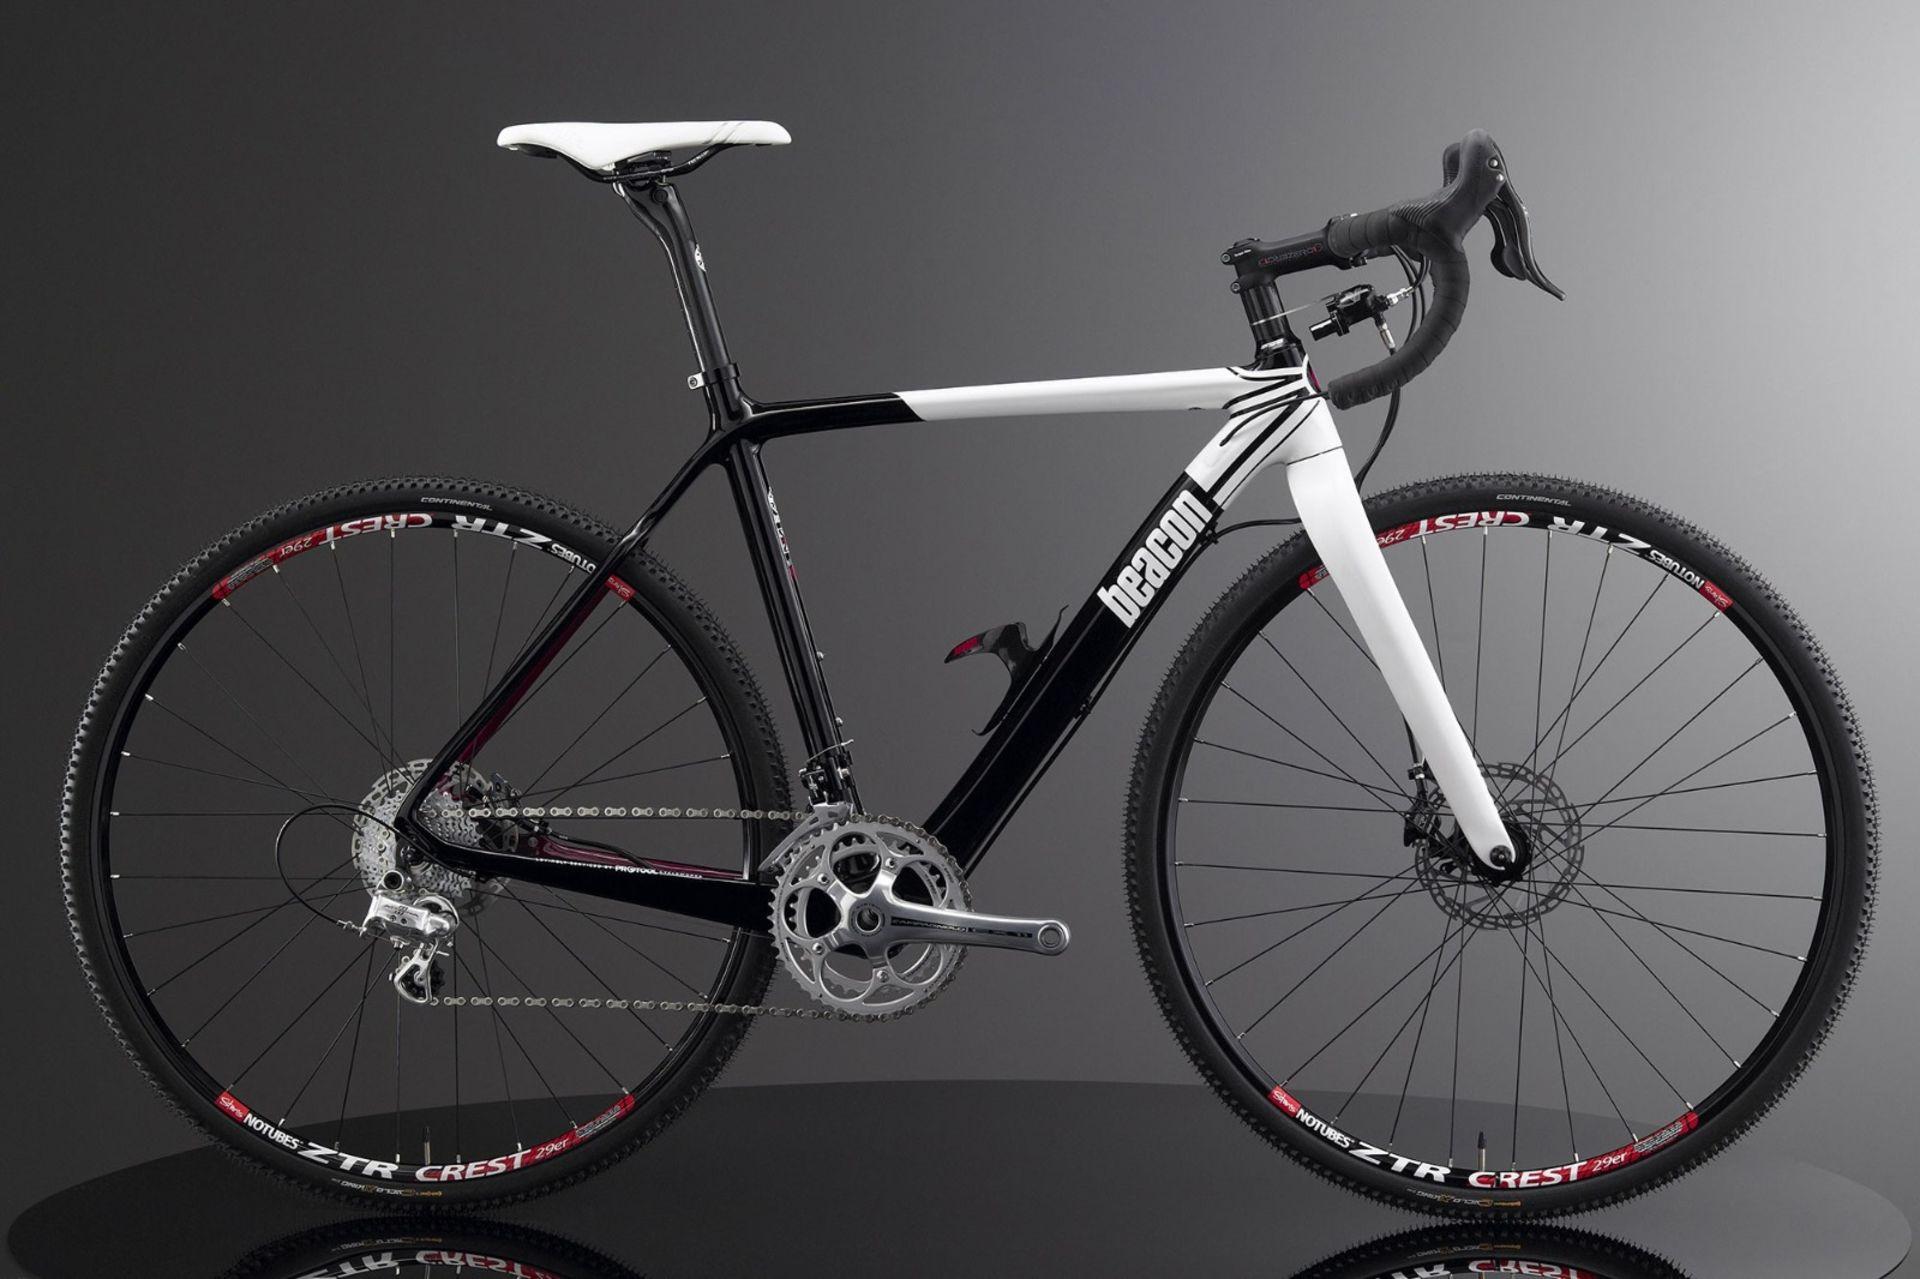 Lot 45 - 1 x Beacon Model BF-45, Size 580, Carbon Fibre Bike Frame in Black & White.